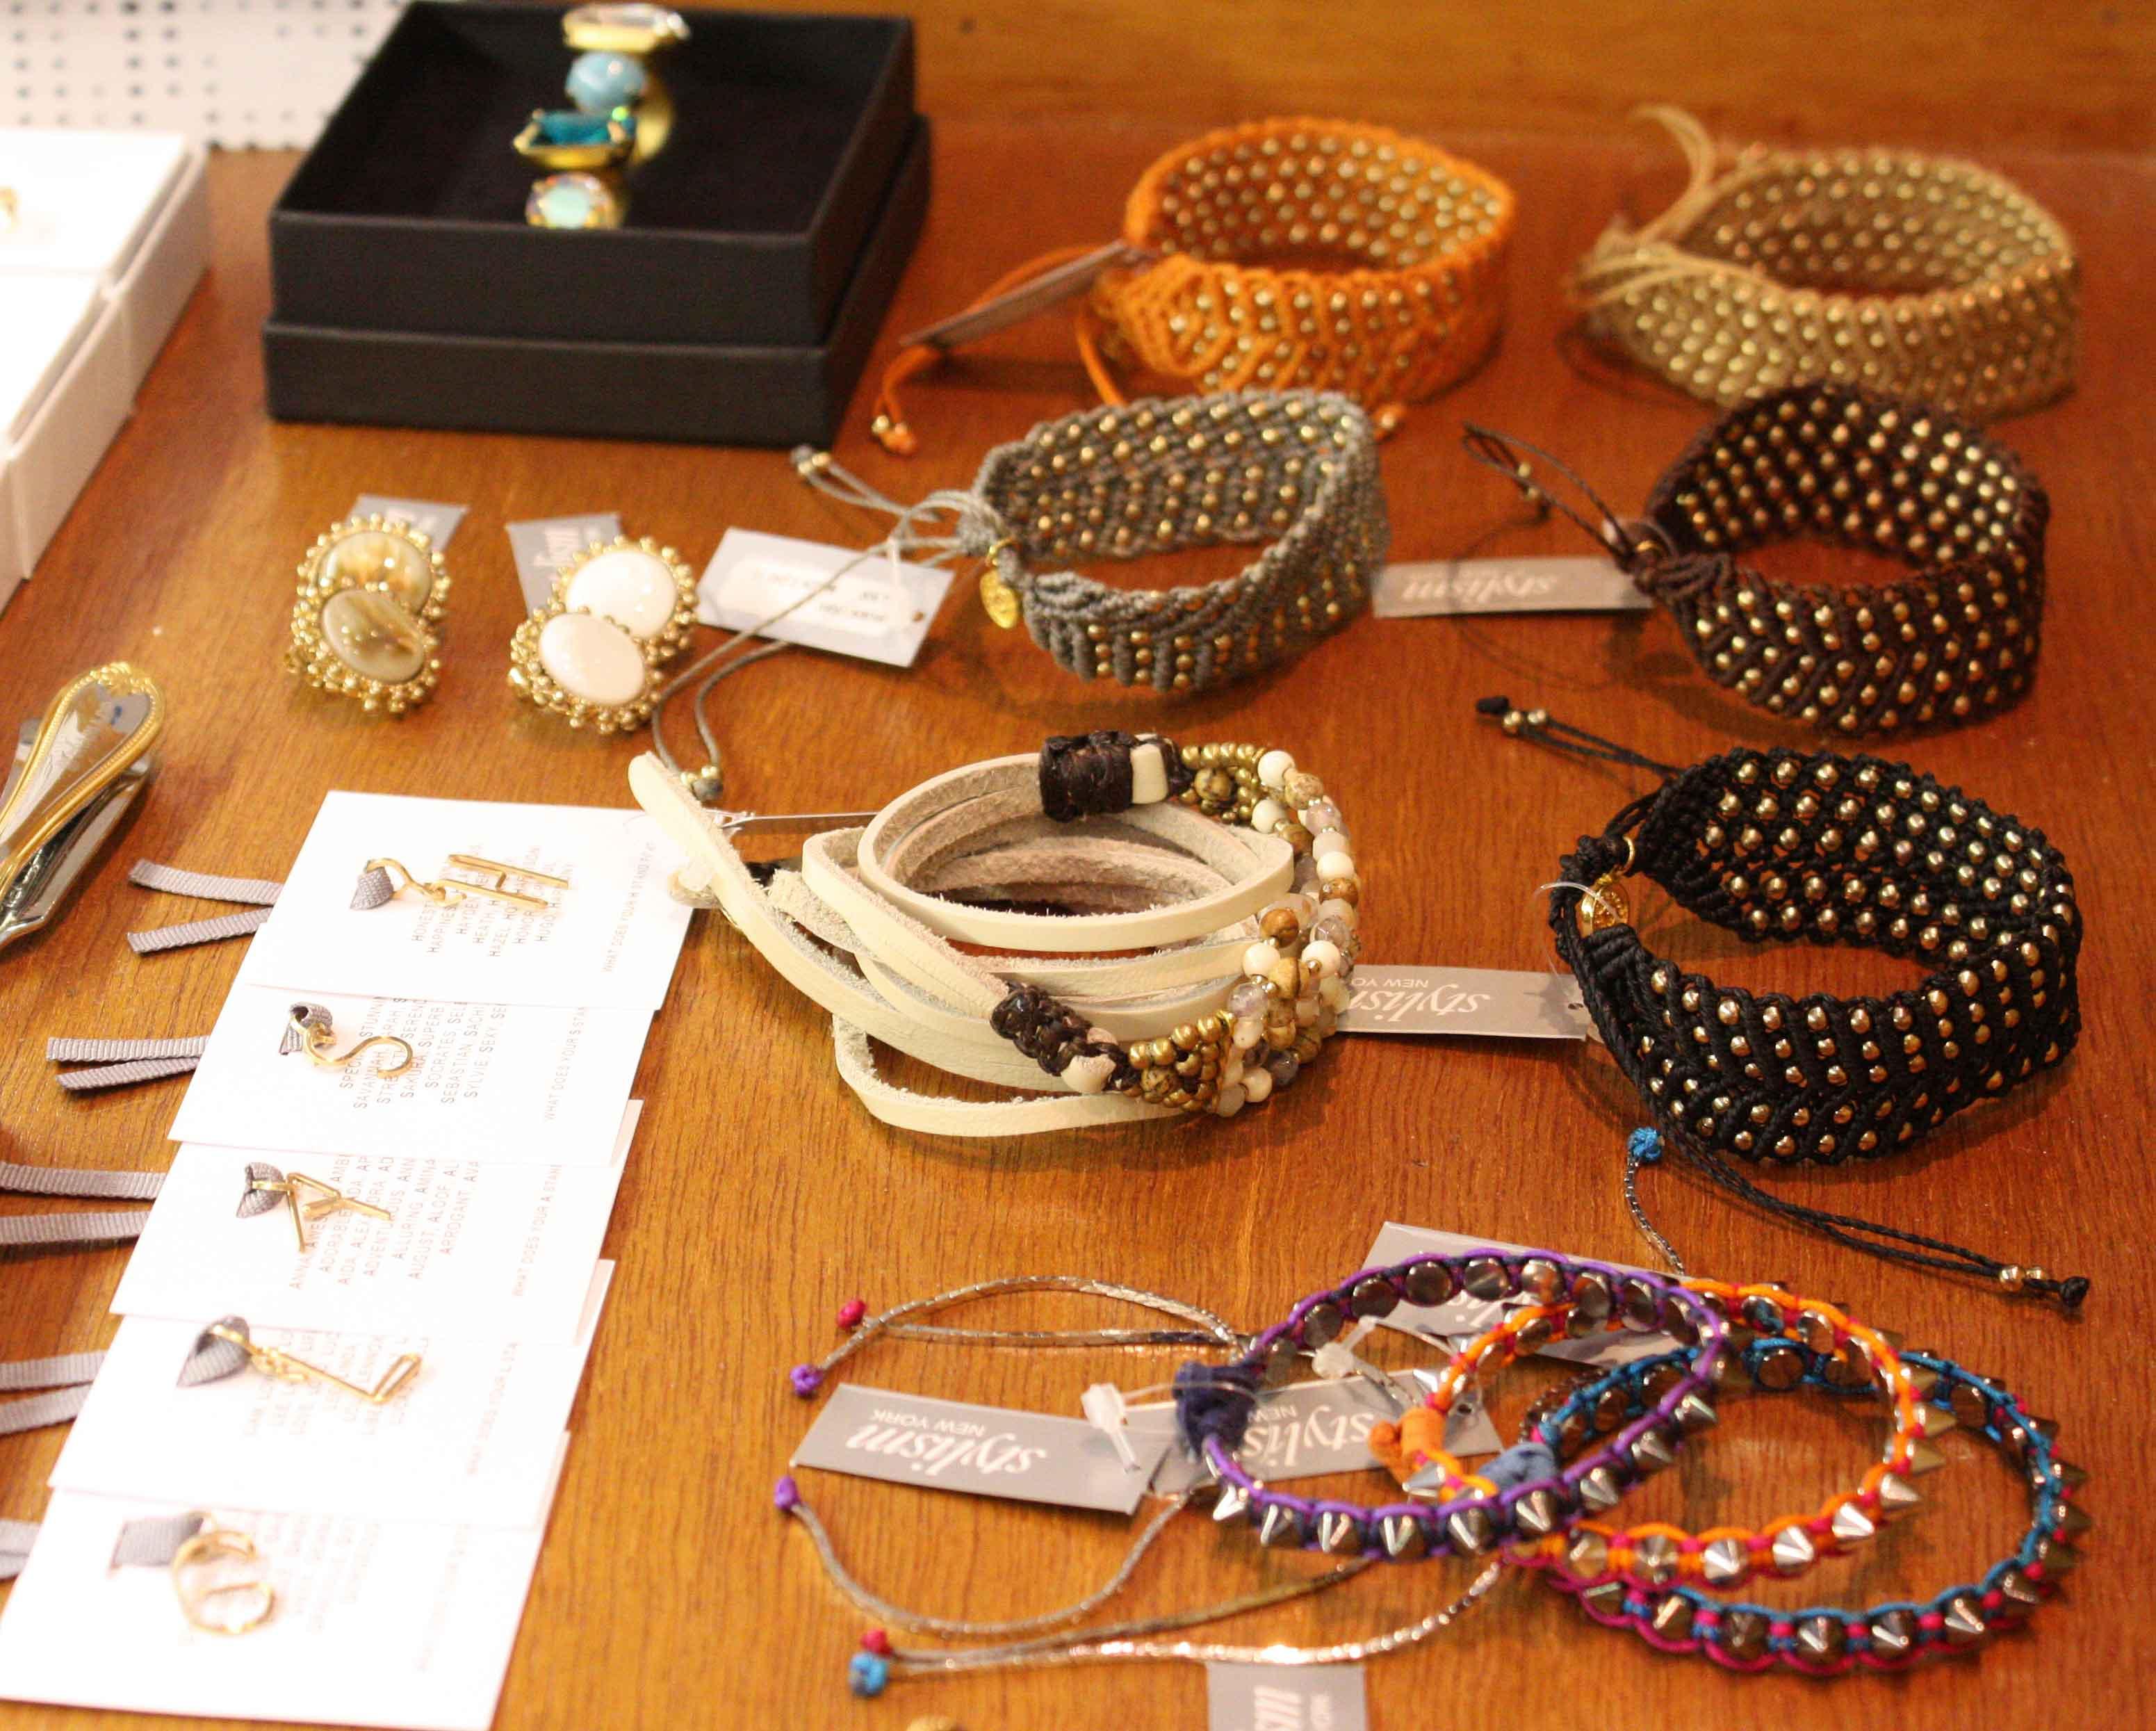 「Accessories! Accessories! Accessories!」_f0208675_14124736.jpg